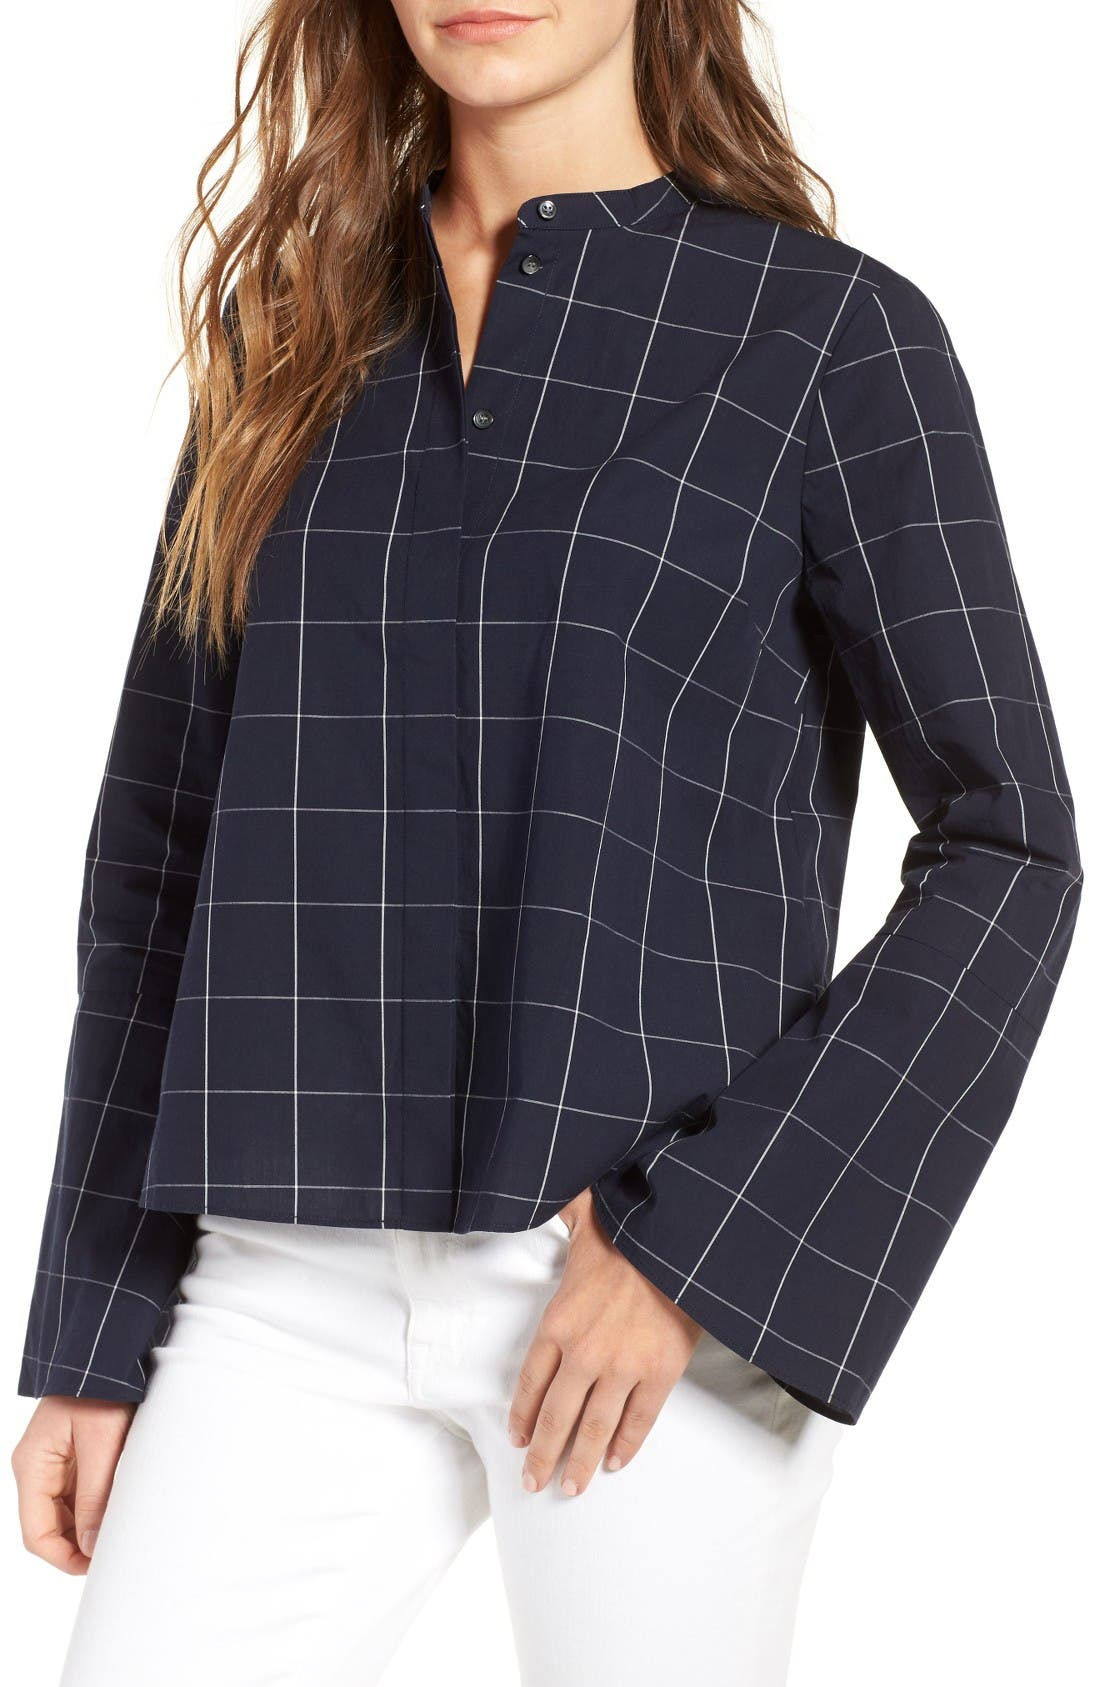 Alternate Image 1 Selected - Madewell Windowpane Bell Sleeve Shirt